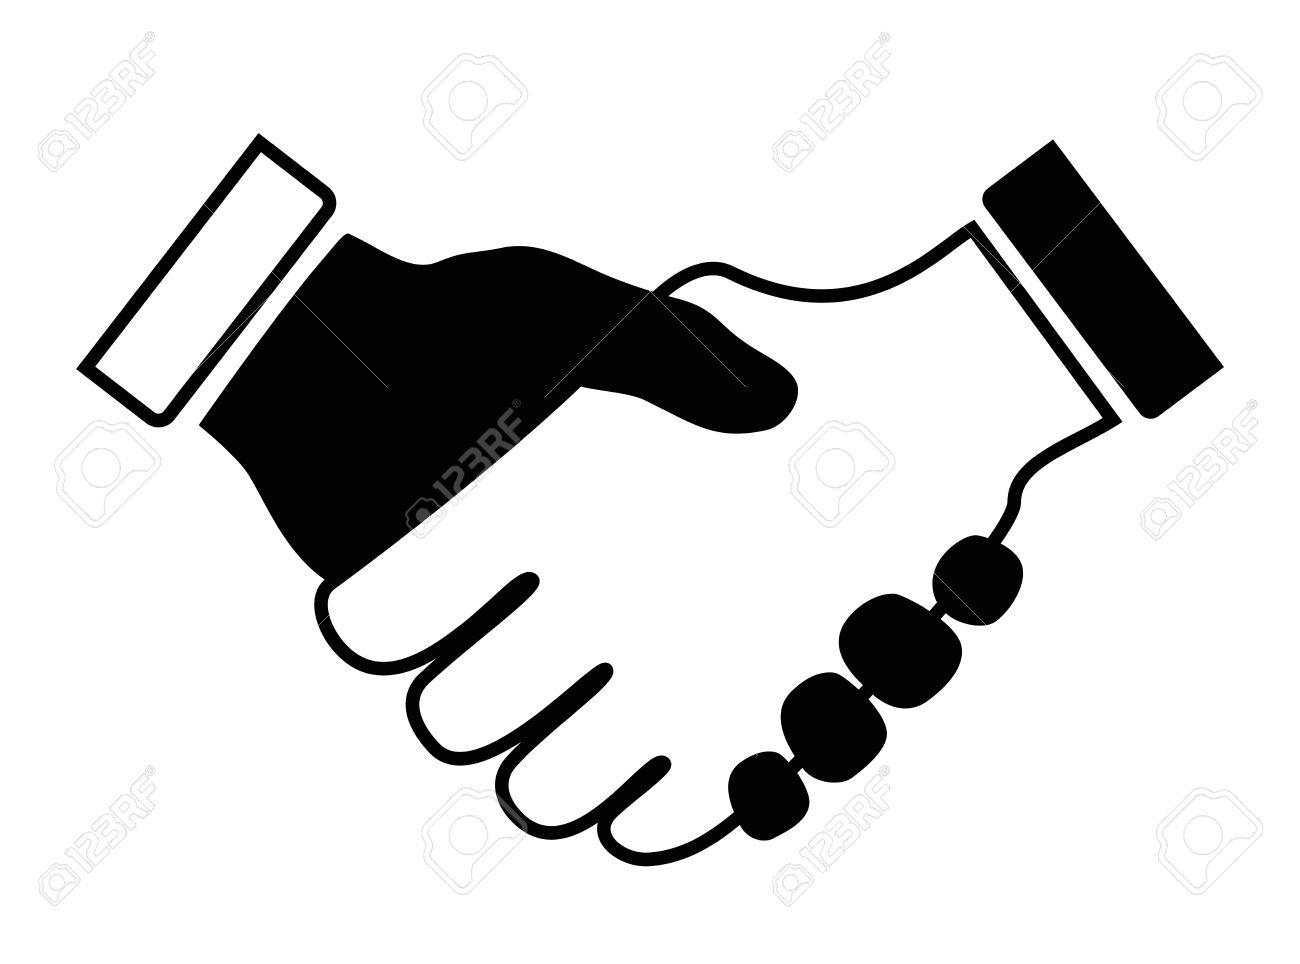 1300x964 Deal Handshake Clipart, Explore Pictures